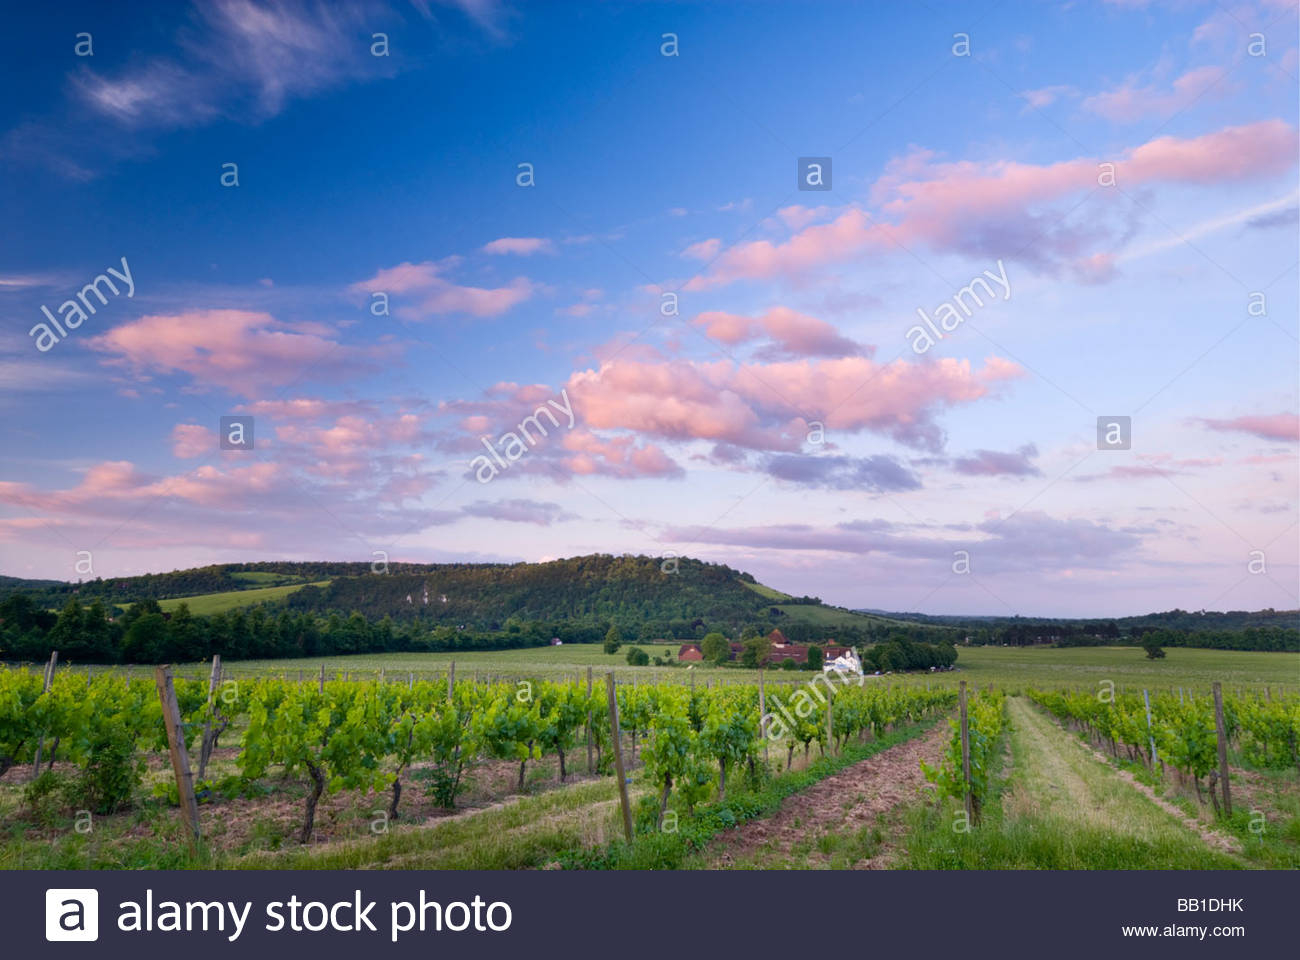 Denbies vigna e cantina, Dorking Surrey, Inghilterra. Immagini Stock